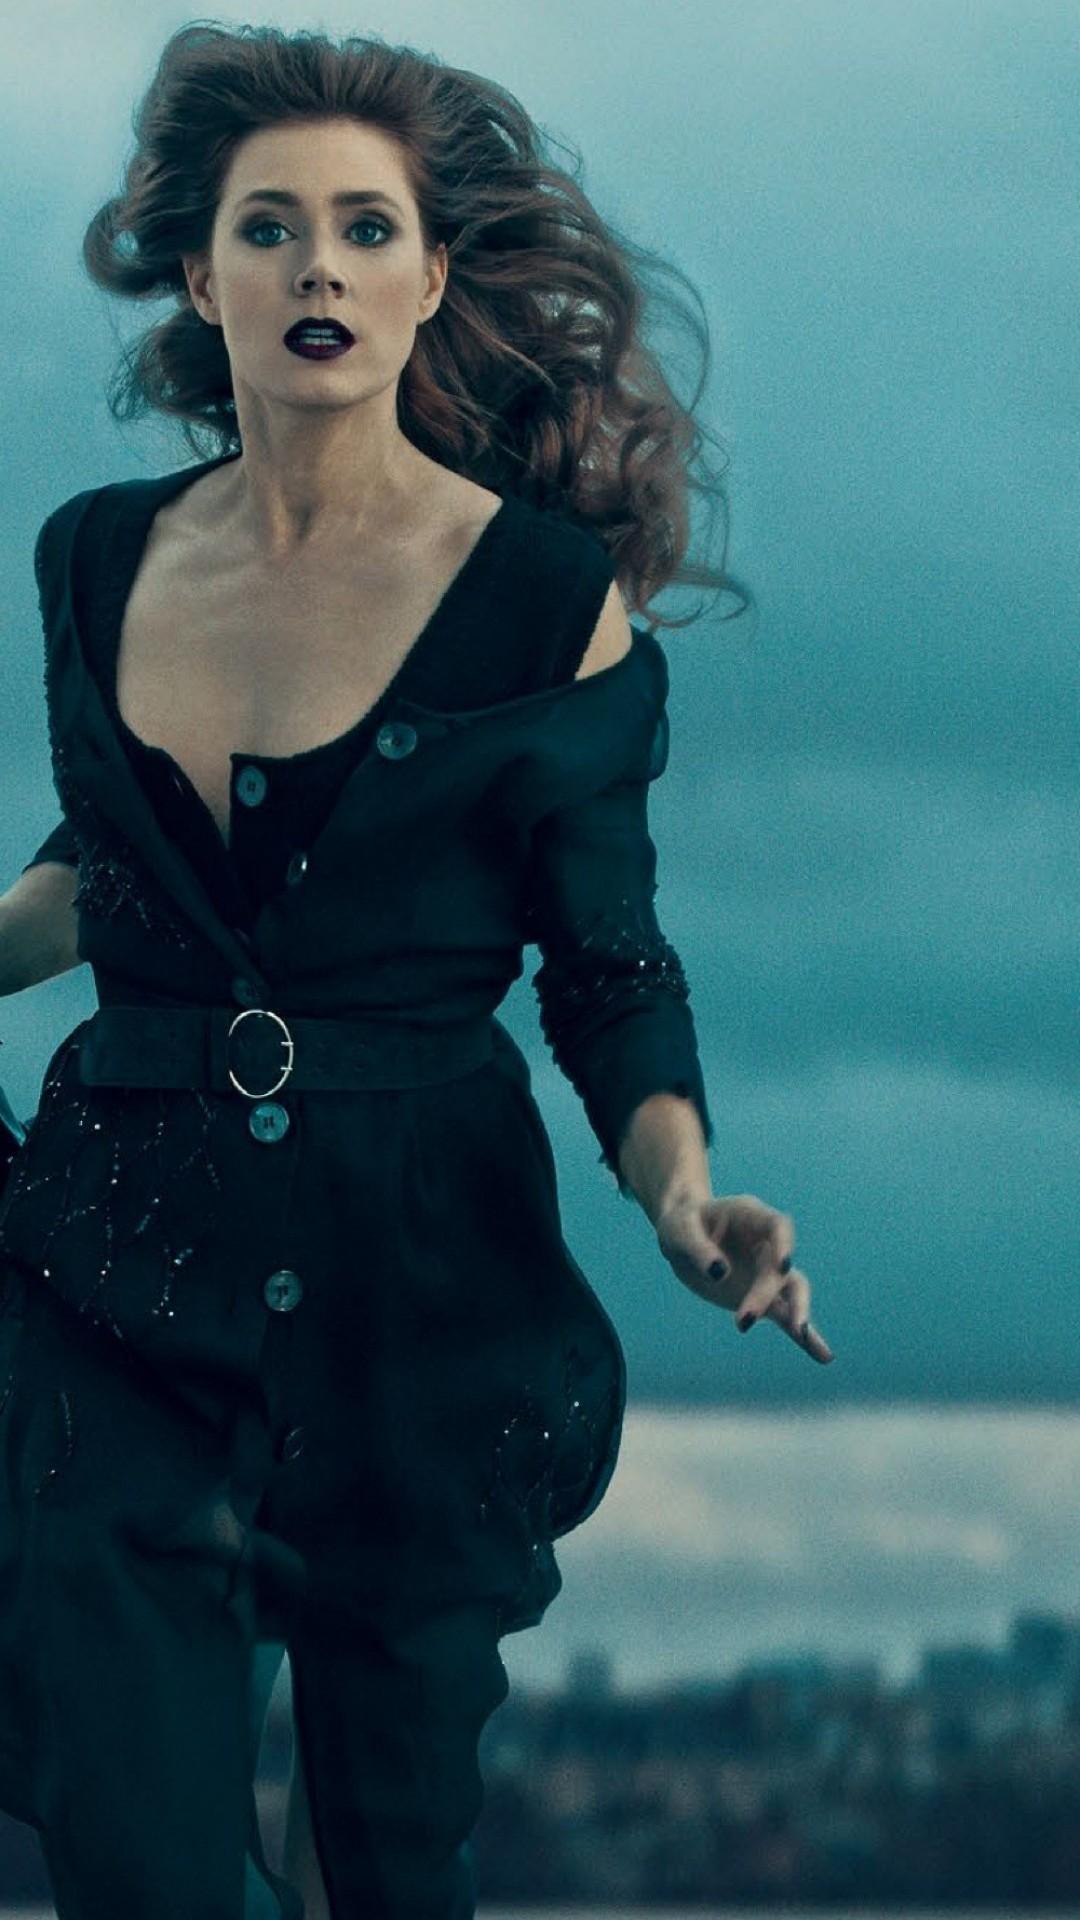 Wallpaper Amy Adams Most Popular Celebs Actress Singer